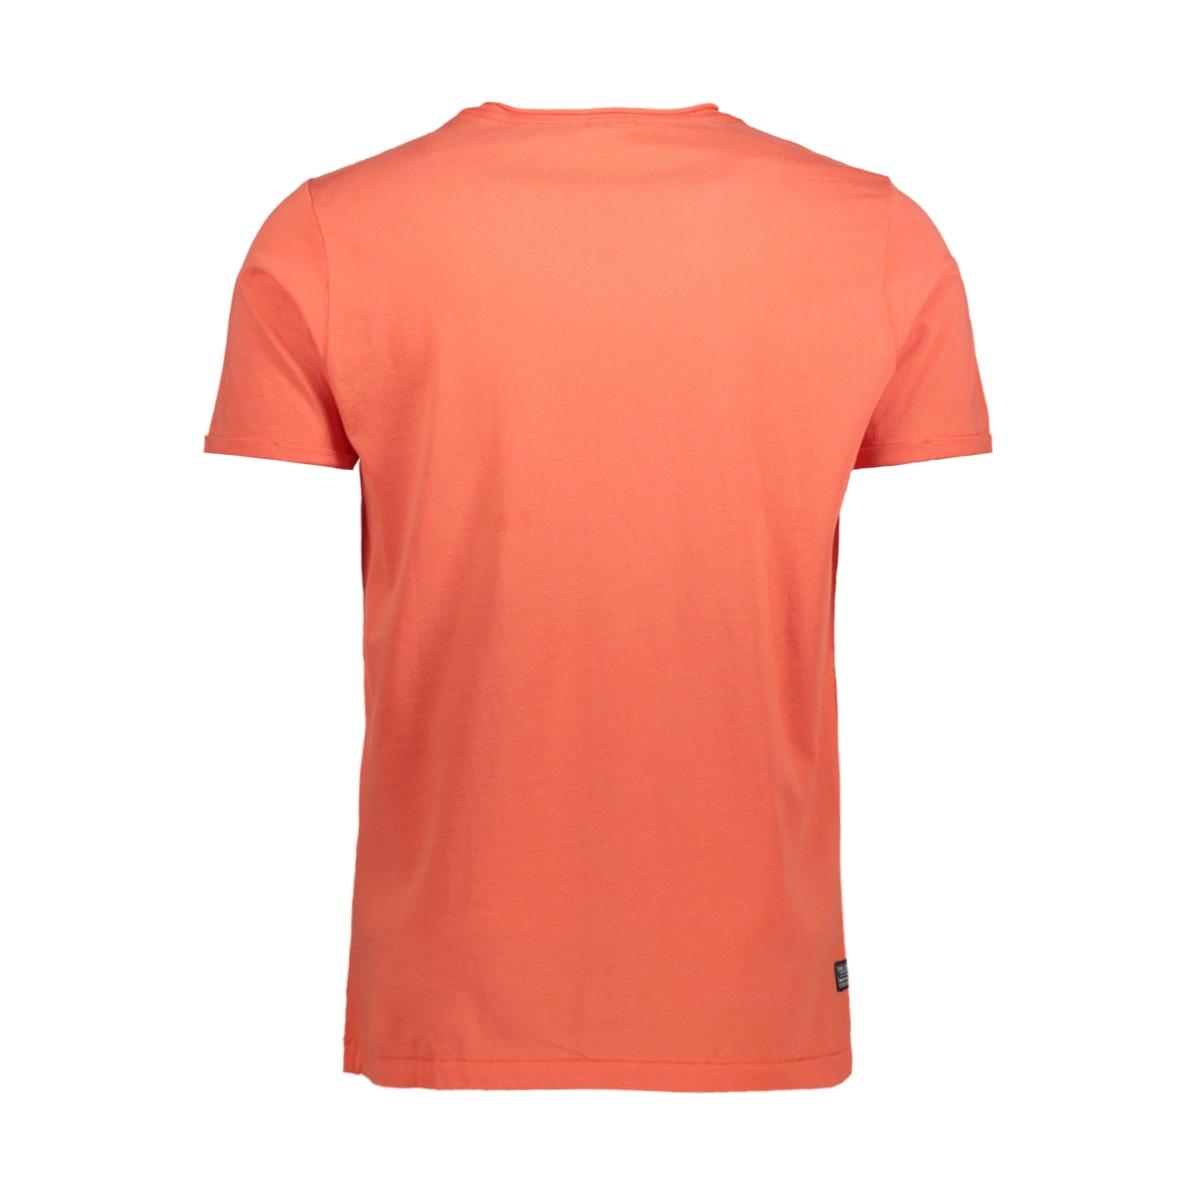 ptss184571 pme legend t-shirt 3078